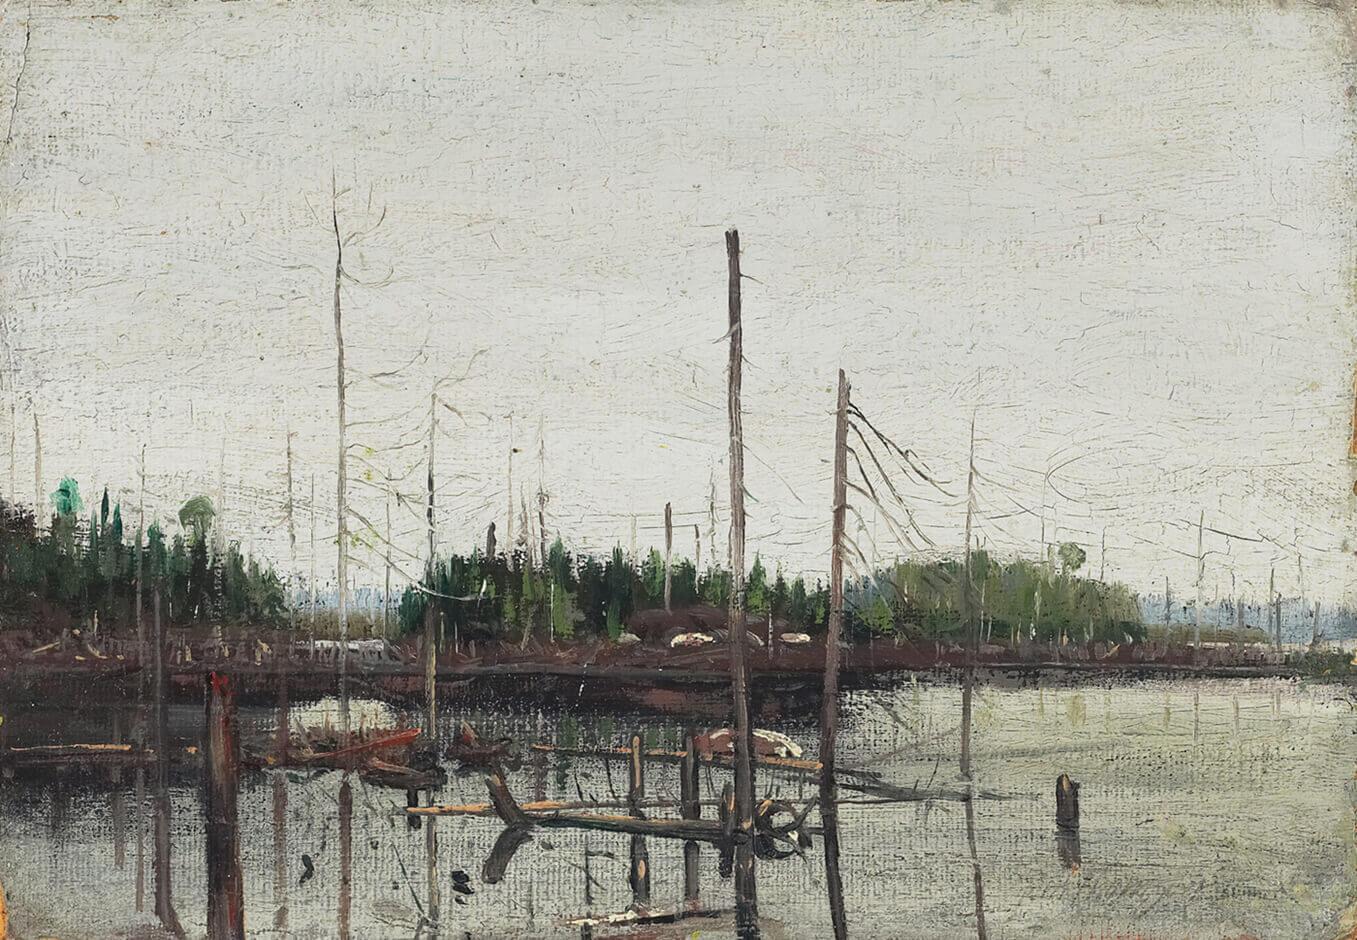 Tom Thomson, Drowned Land, 1912